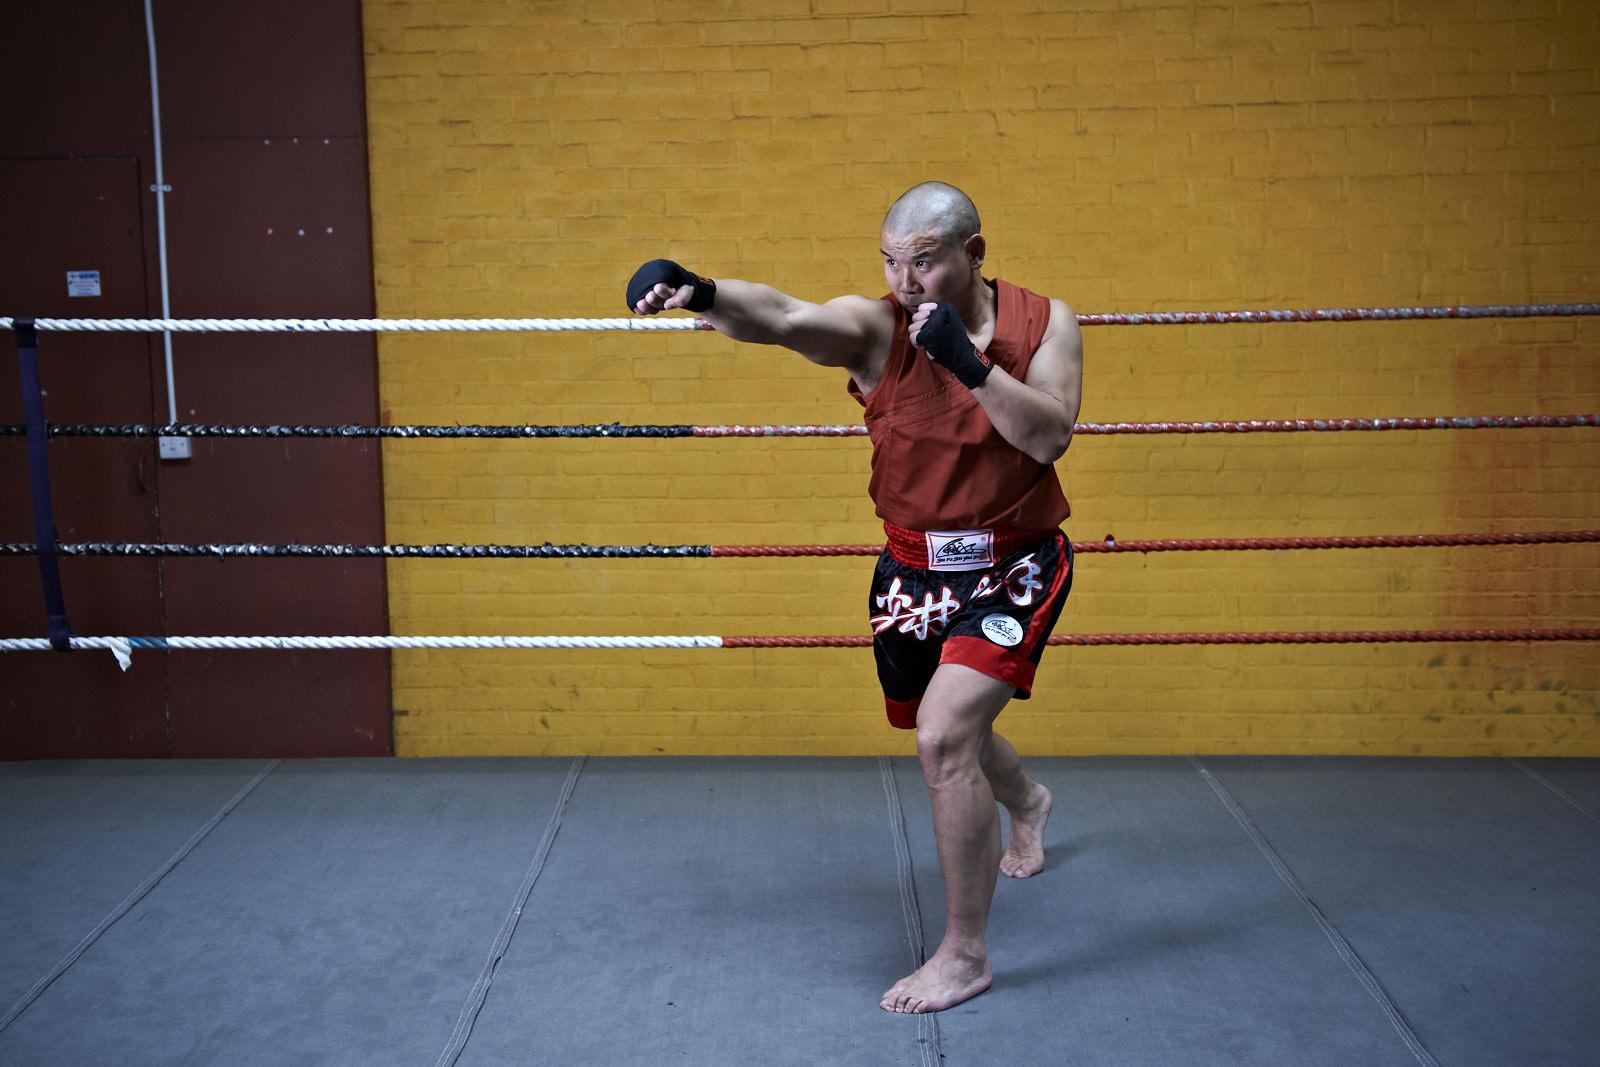 Shaolin temple uk shifu yanzi kick 4.jpg